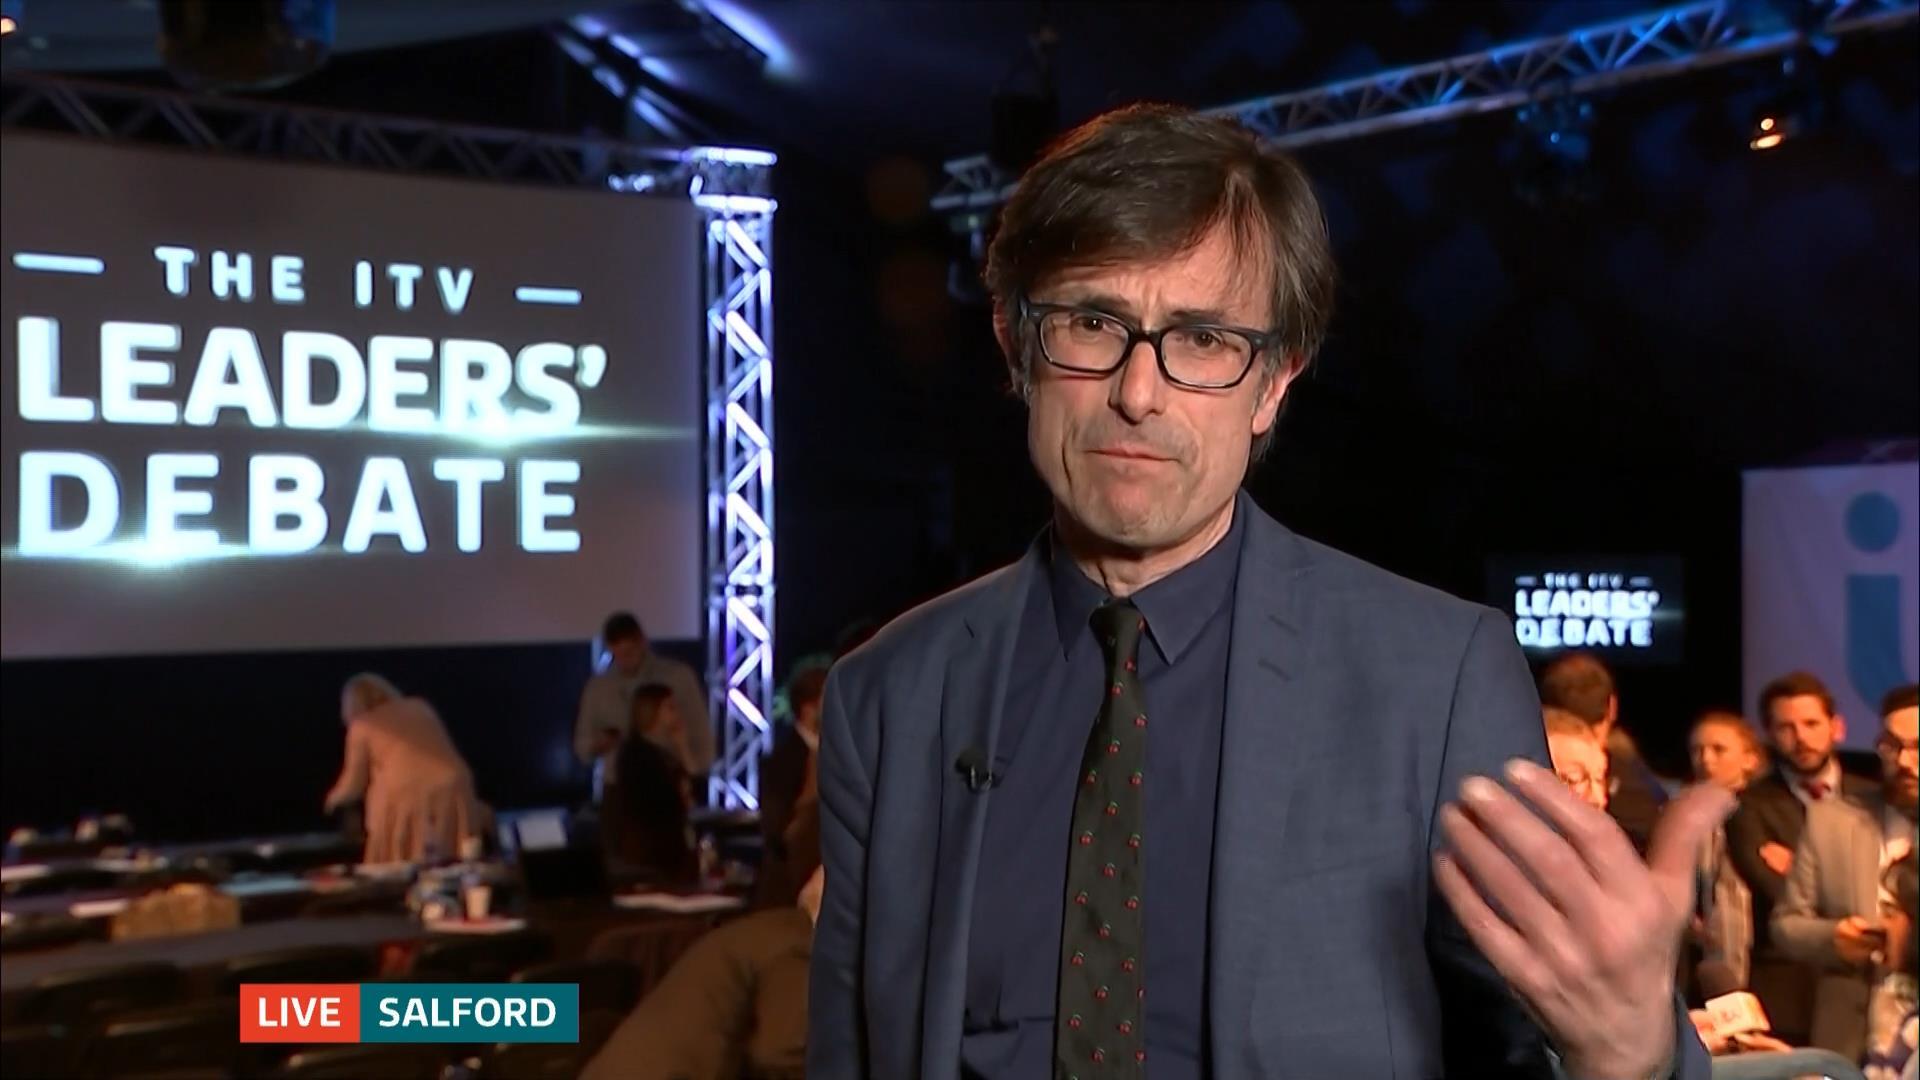 Robert Peston - ITV News Reporter (2)